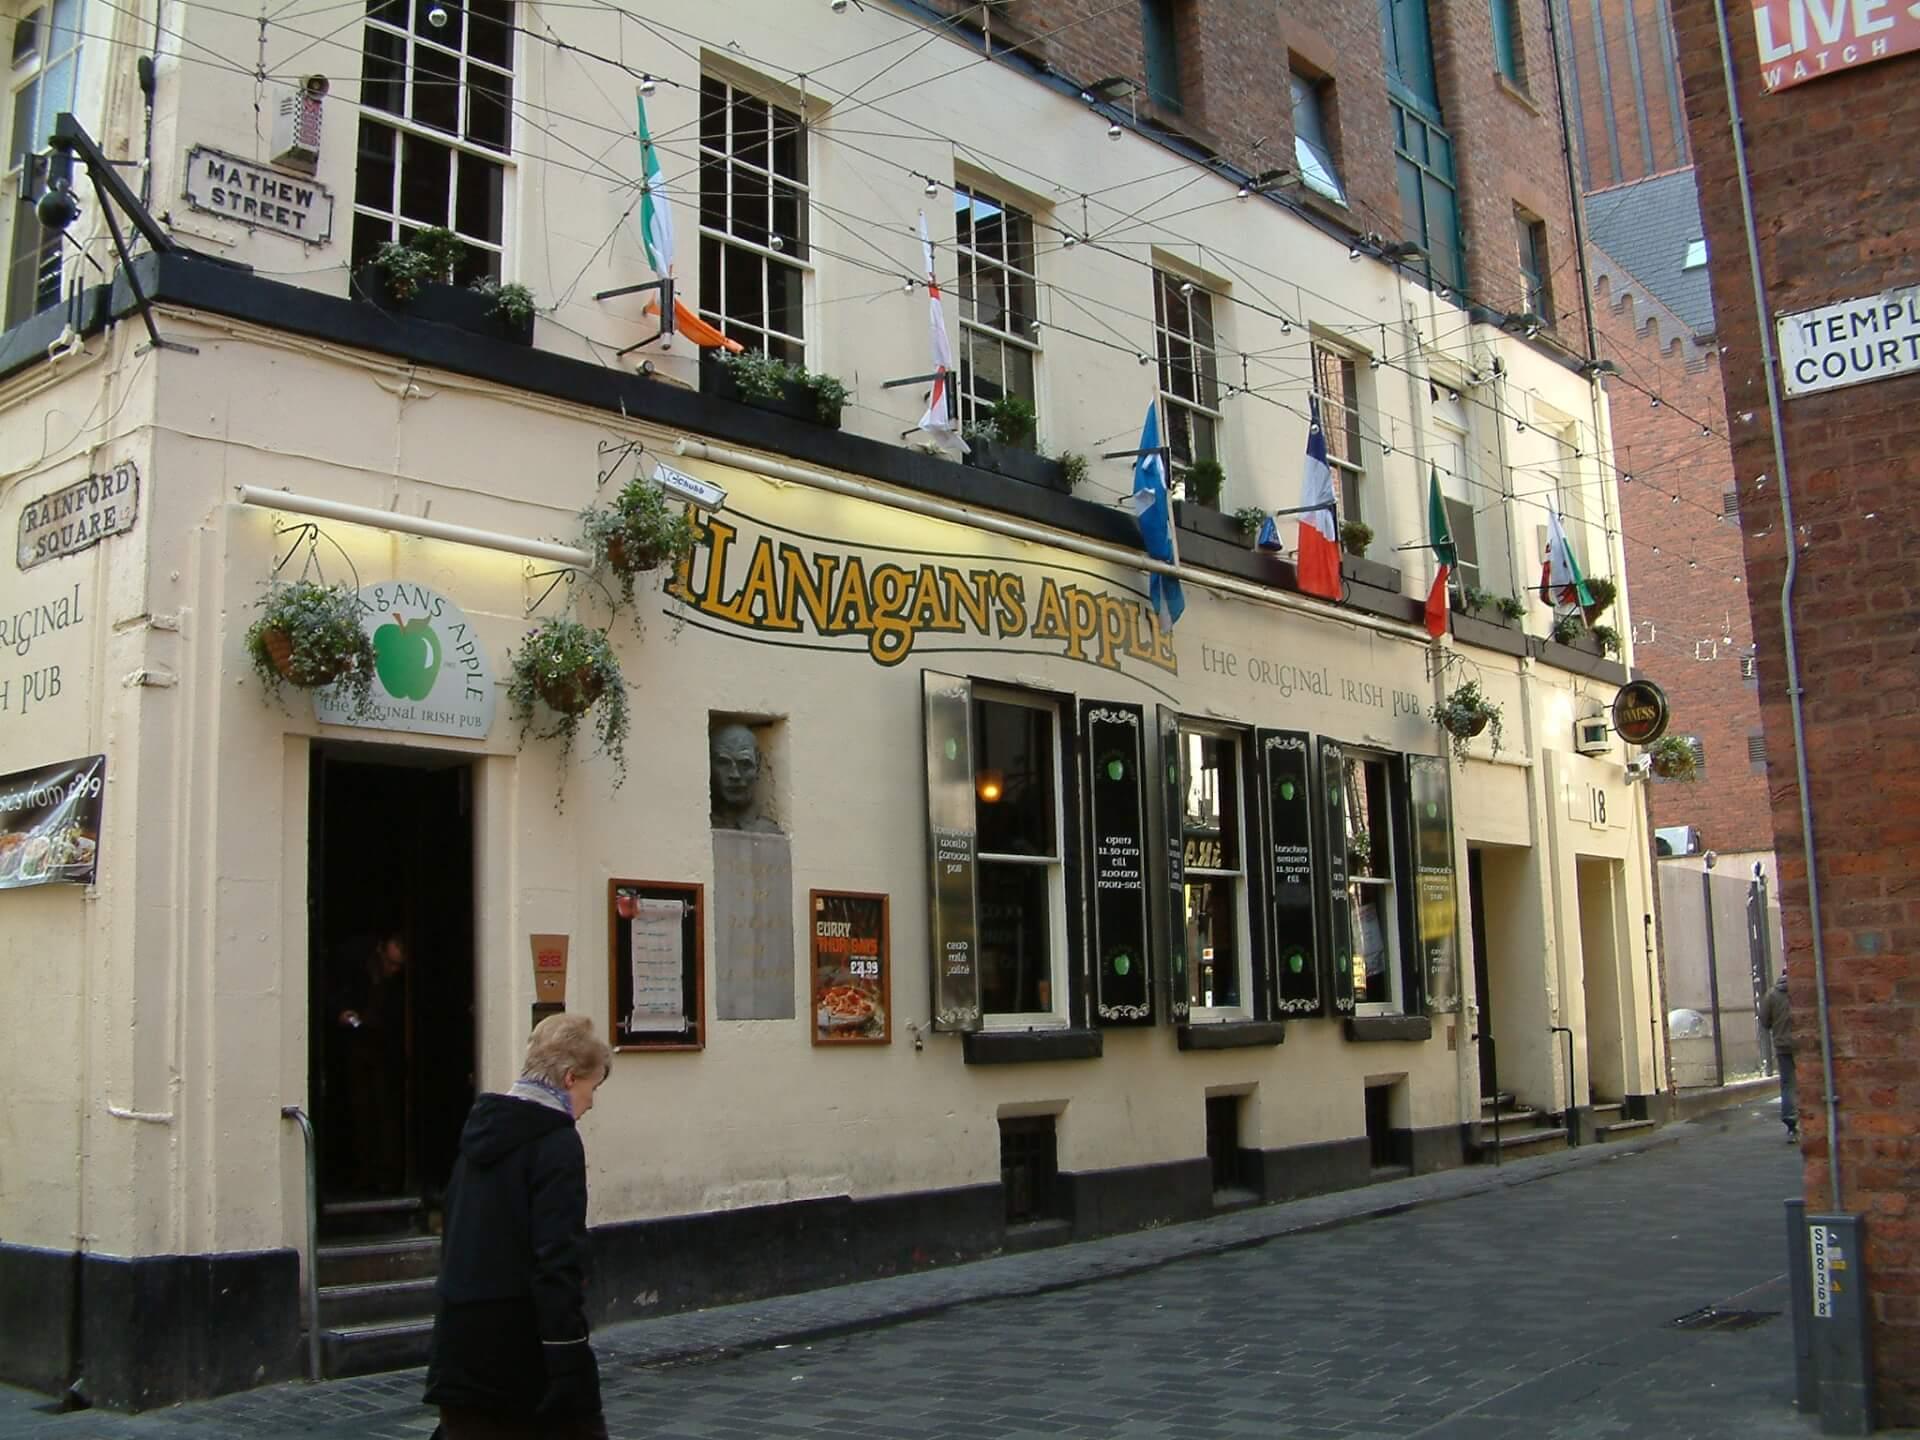 Flanagan's Apple Liverpool Matthew Street